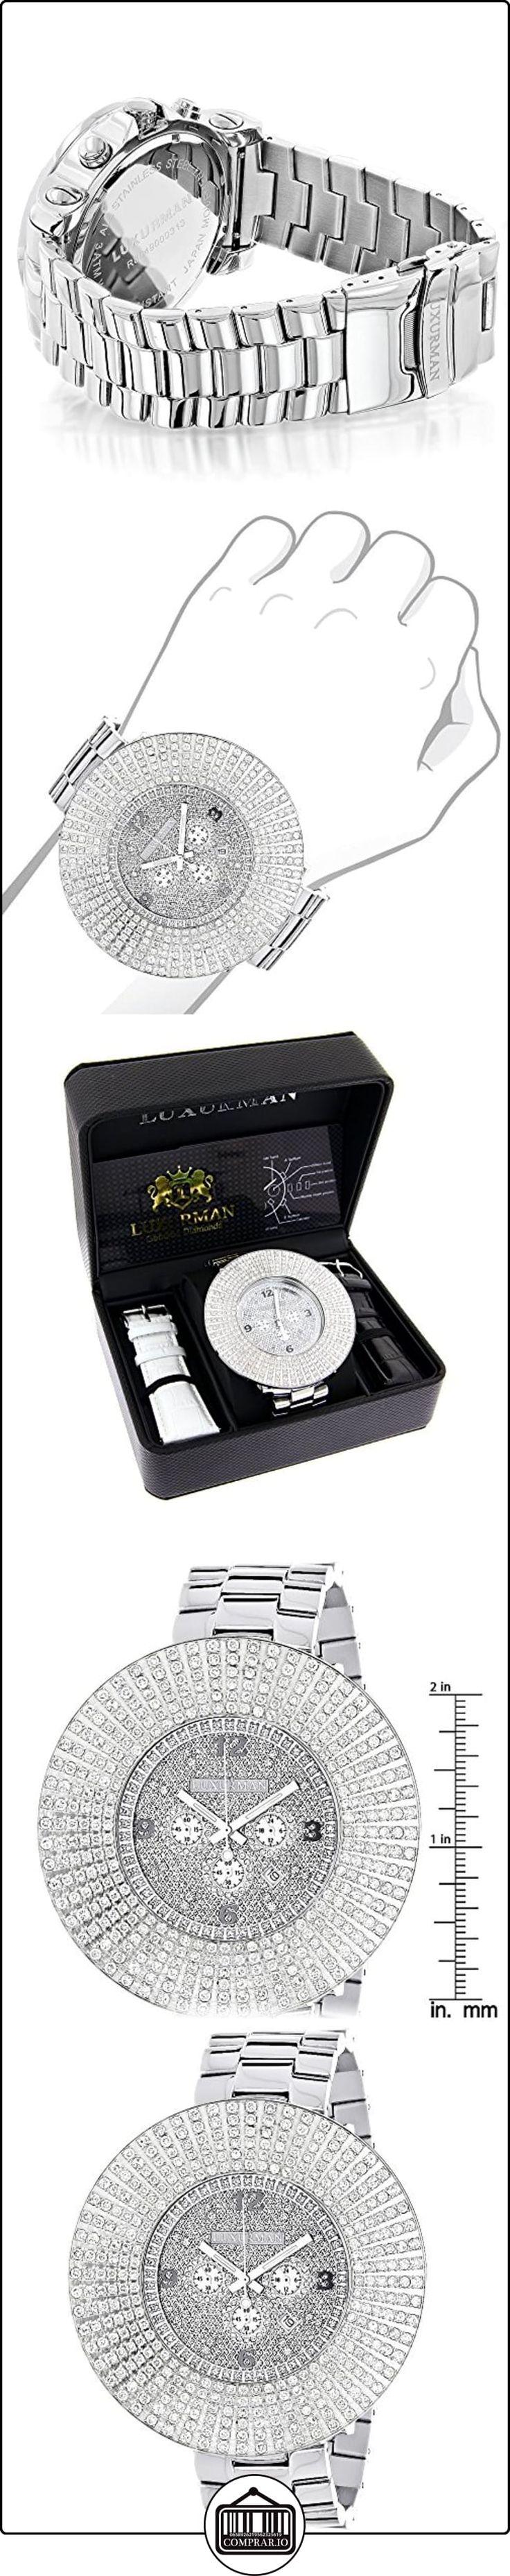 Large Diamond Bezel LUXURMAN Watch Escalade 14 ct Mens Hip Hop Watches  ✿ Relojes para hombre - (Lujo) ✿